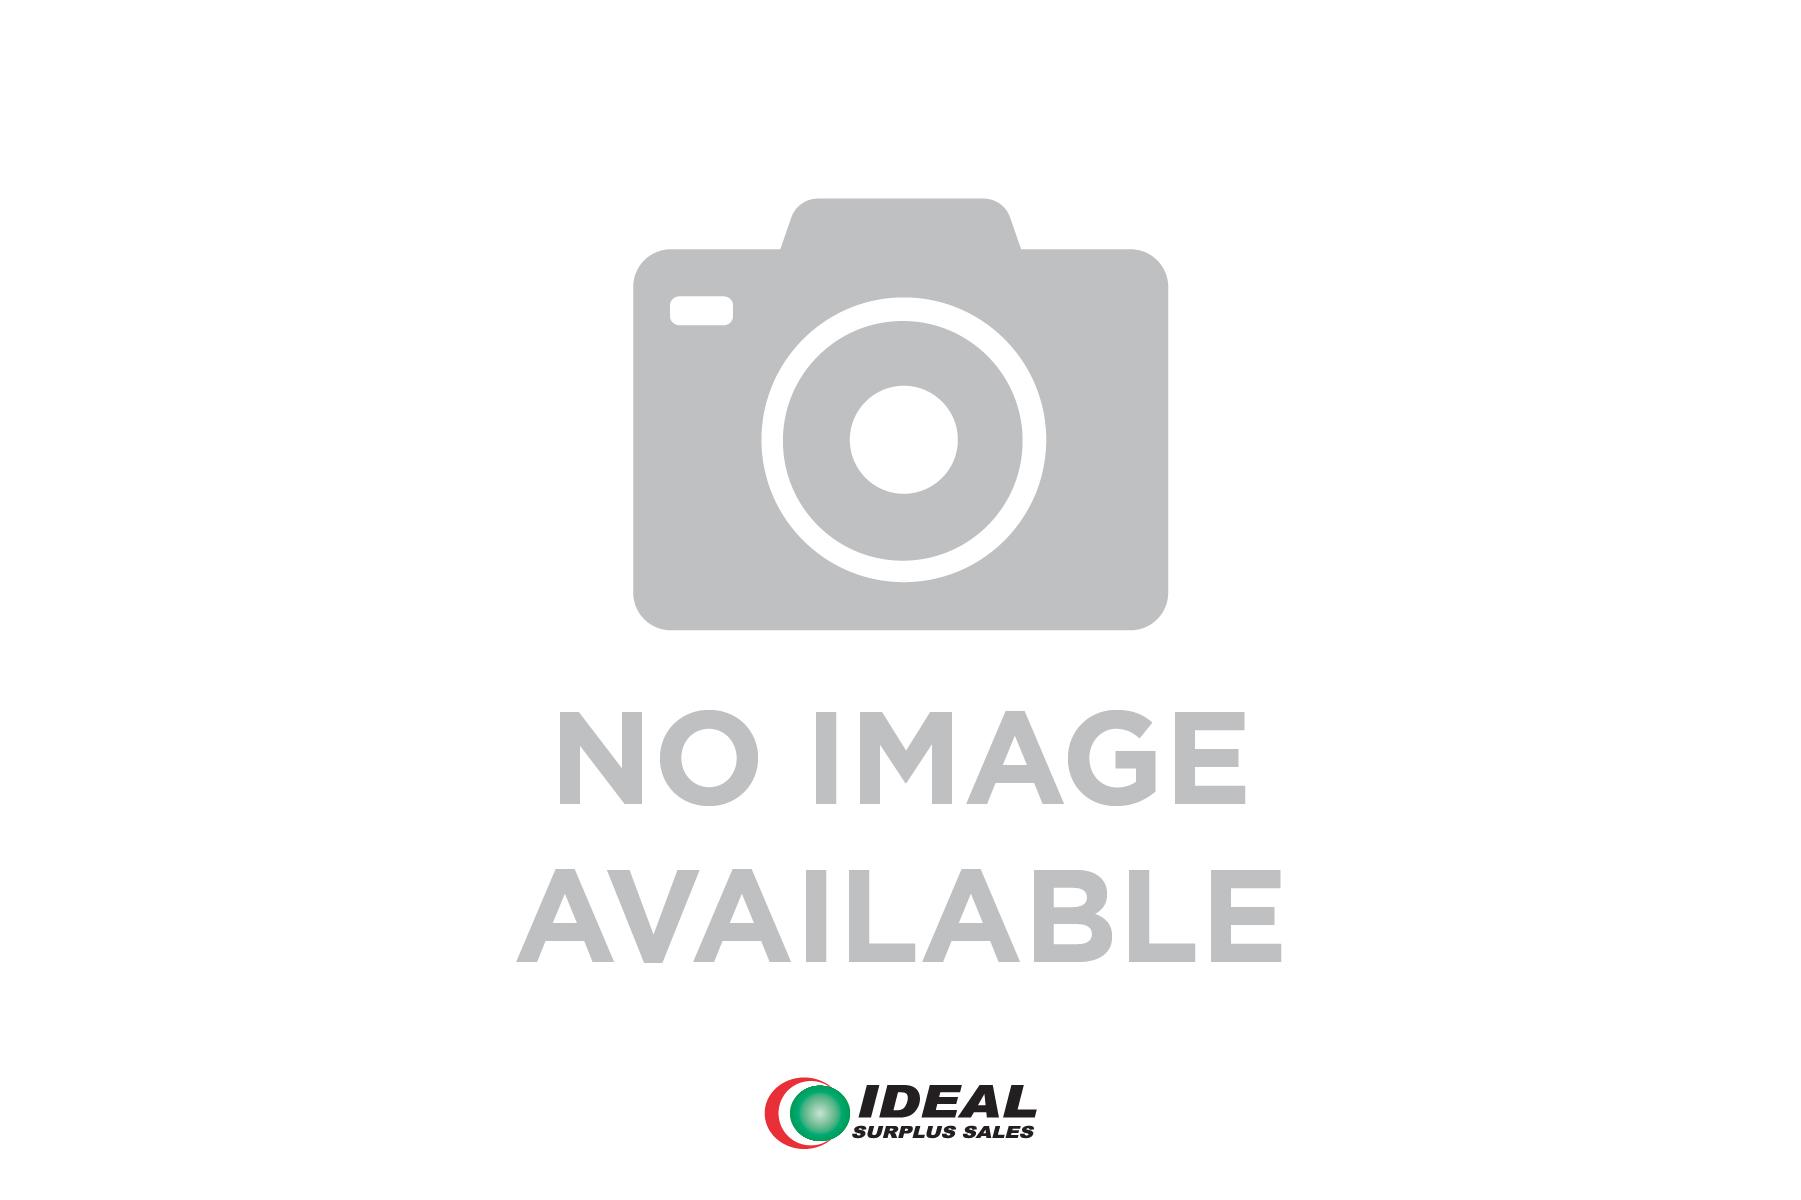 KIMBERLY CLARK 990510 NEW IN BOX